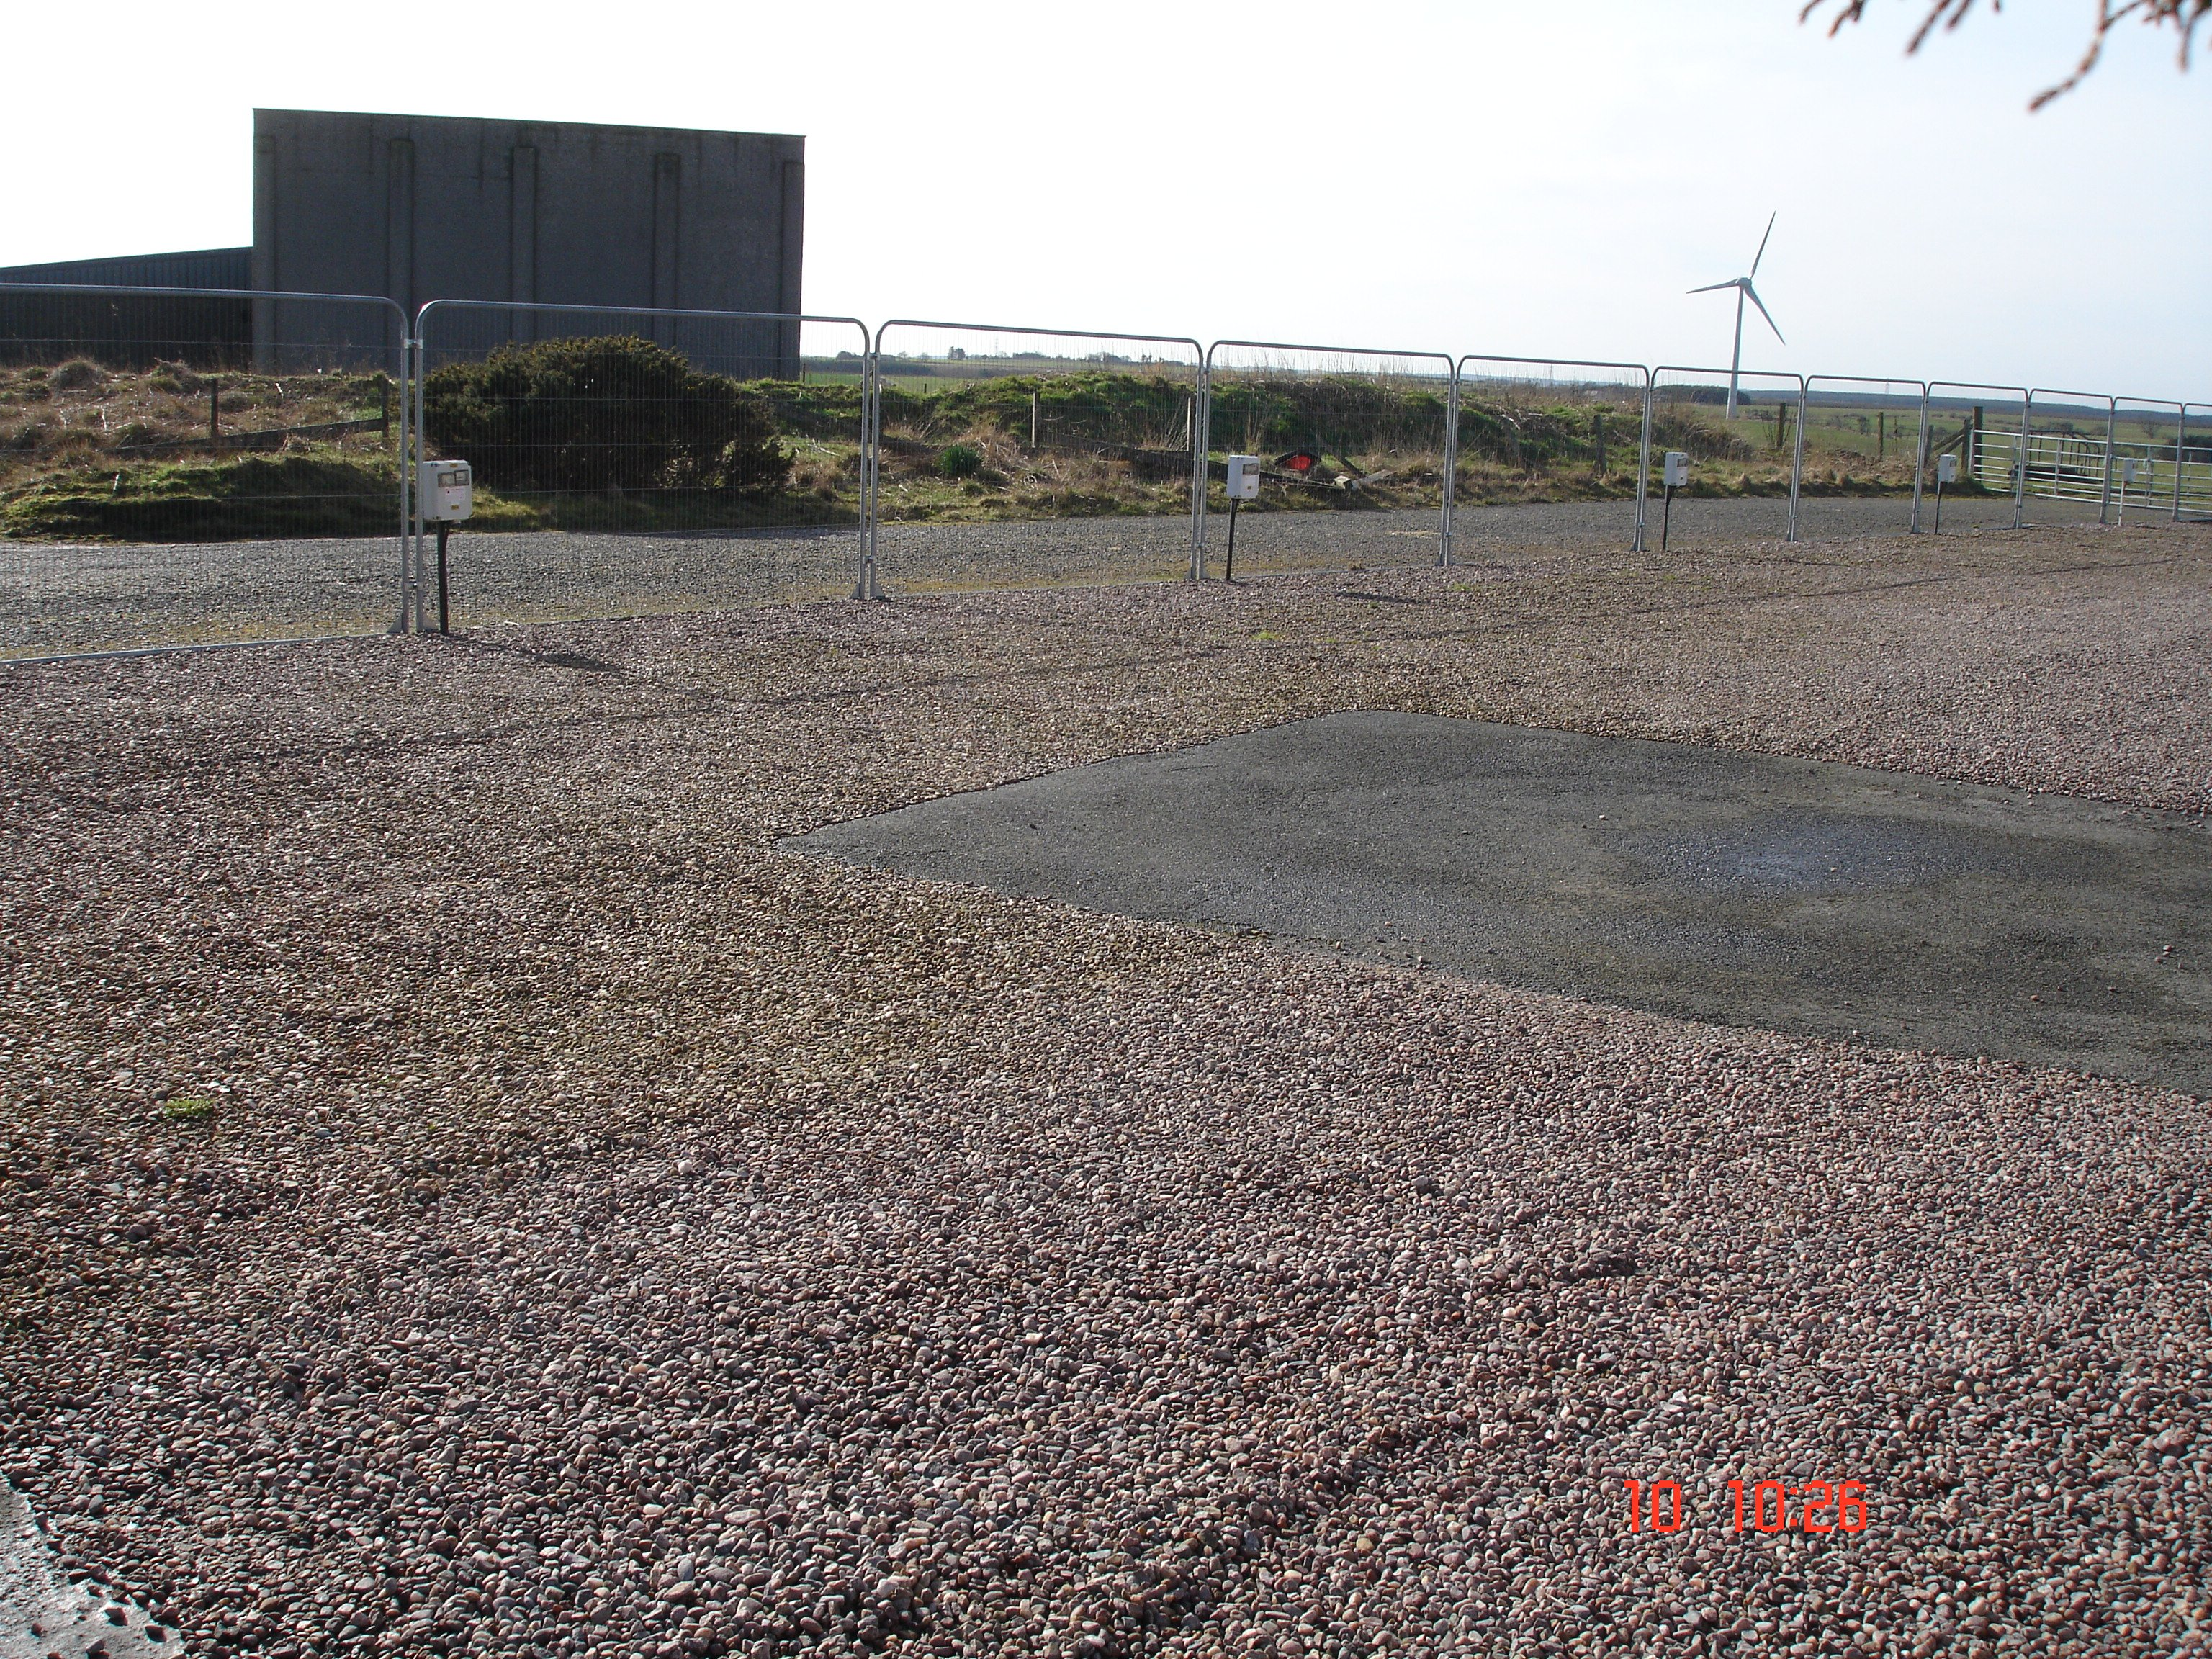 a fenced empty ground